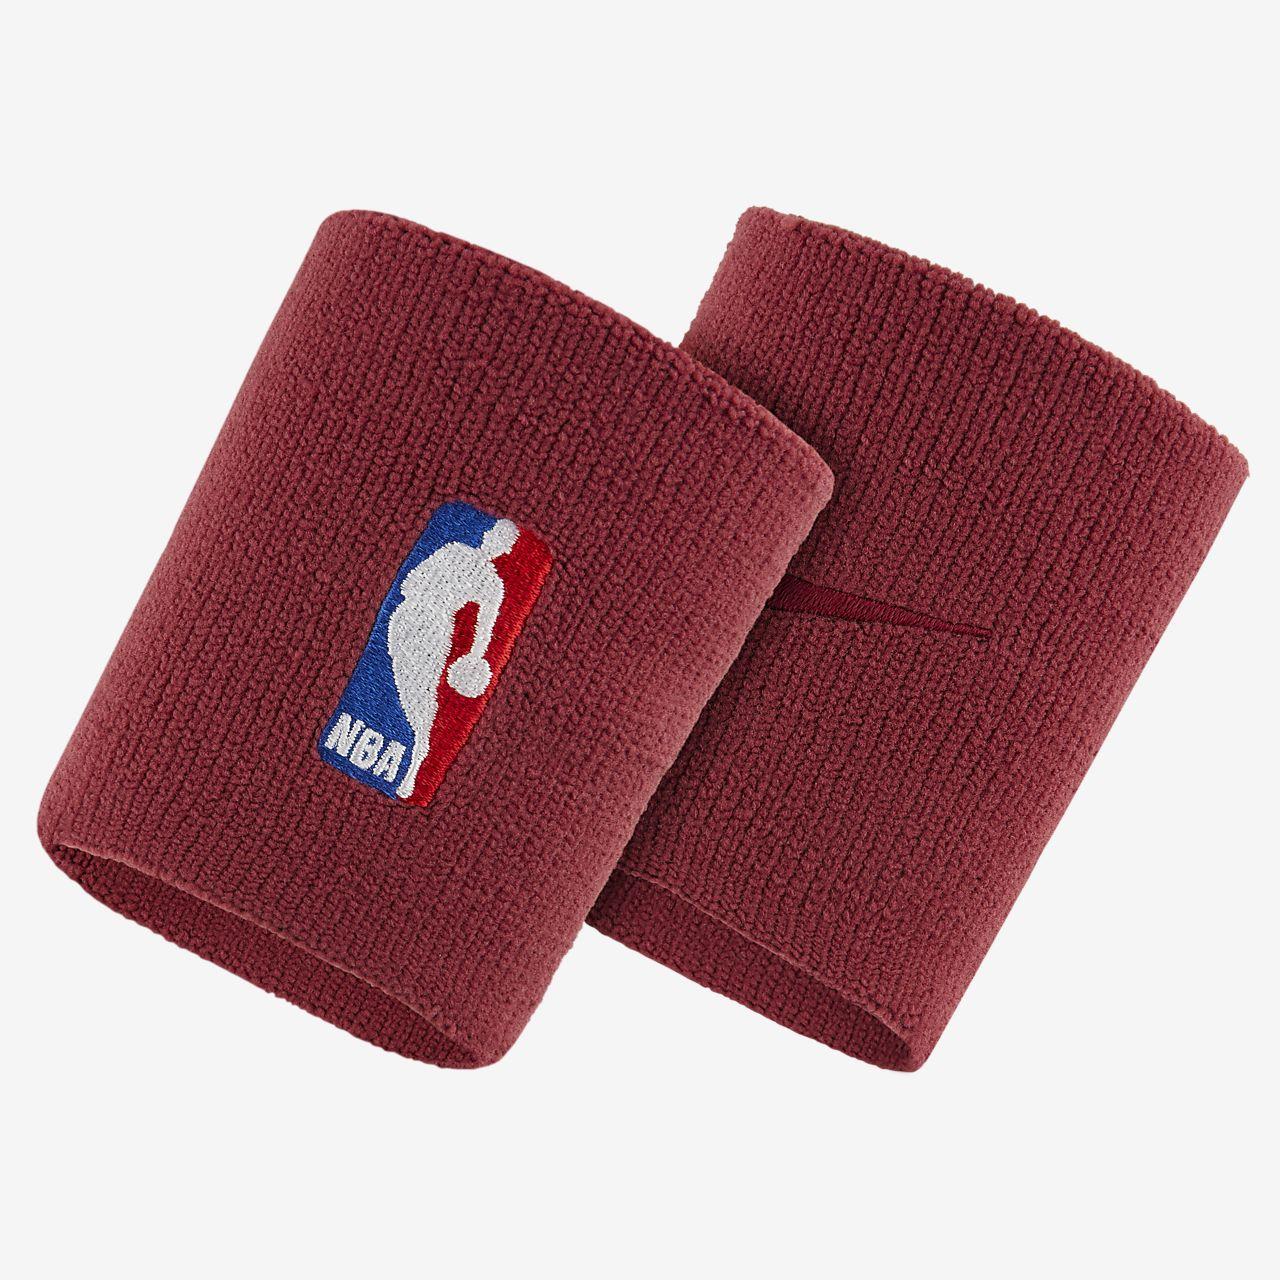 Polsini da basket Nike NBA Elite